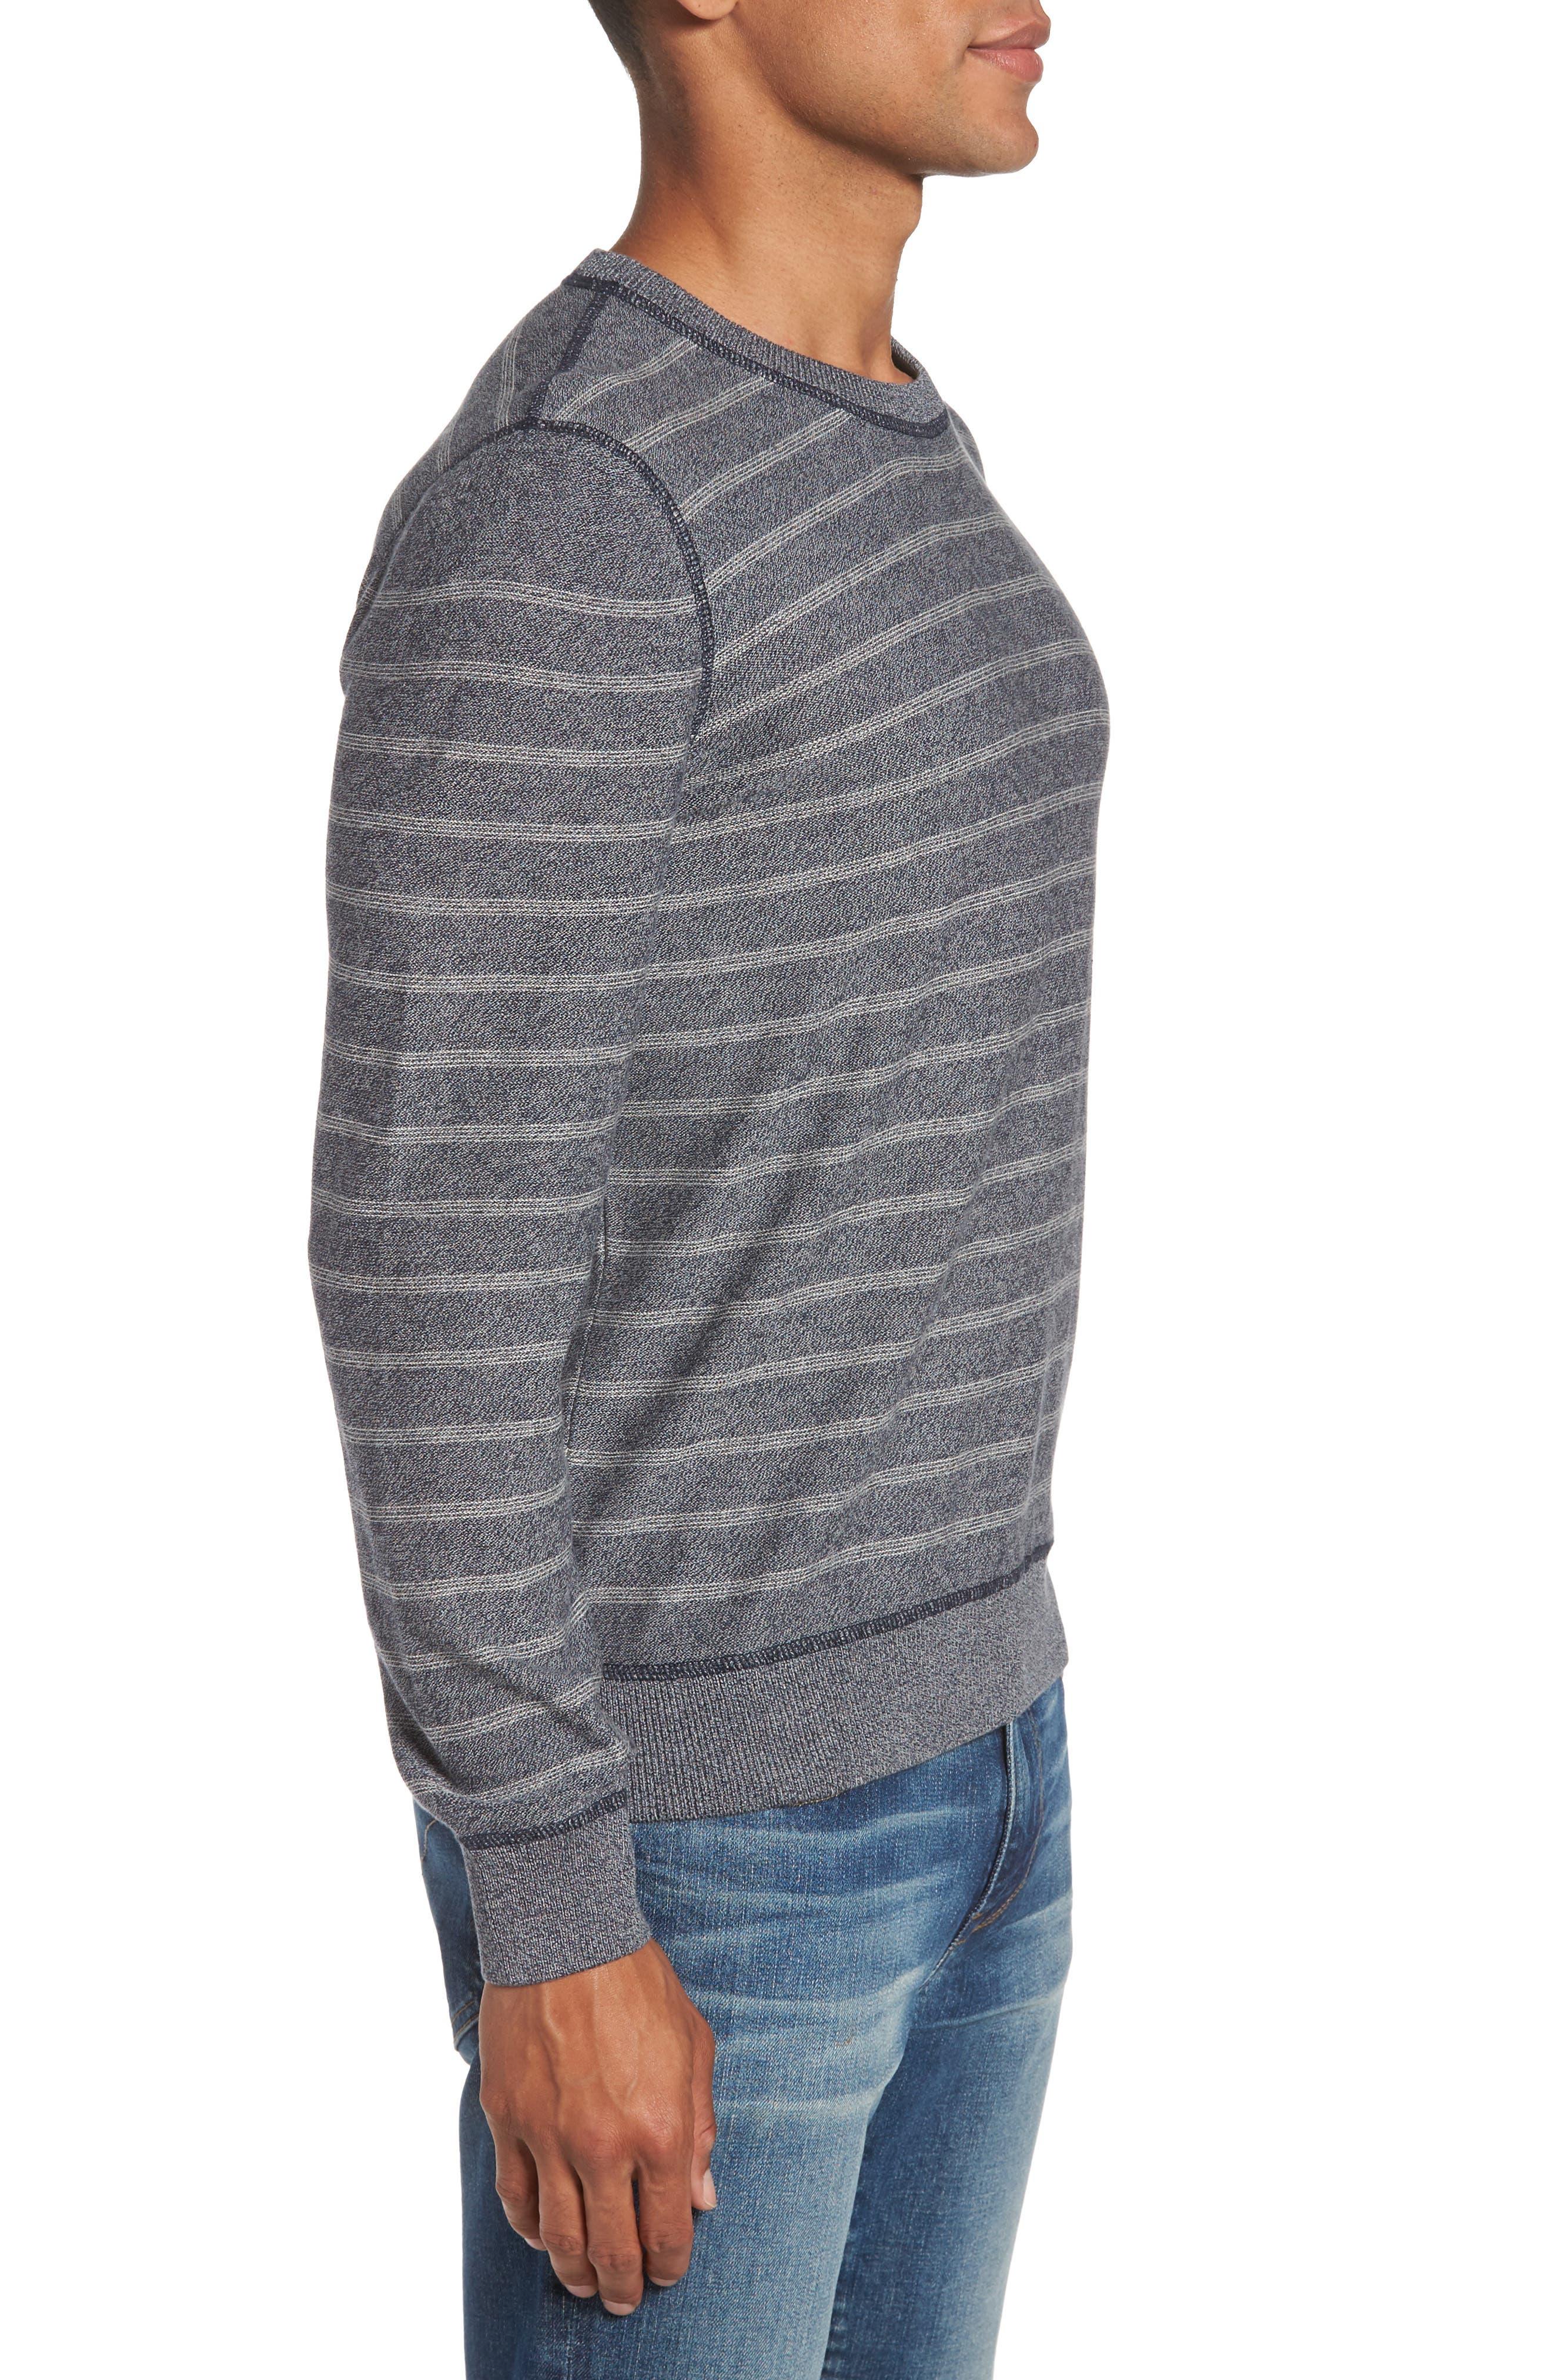 Tanner Crewneck Sweatshirt,                             Alternate thumbnail 3, color,                             021